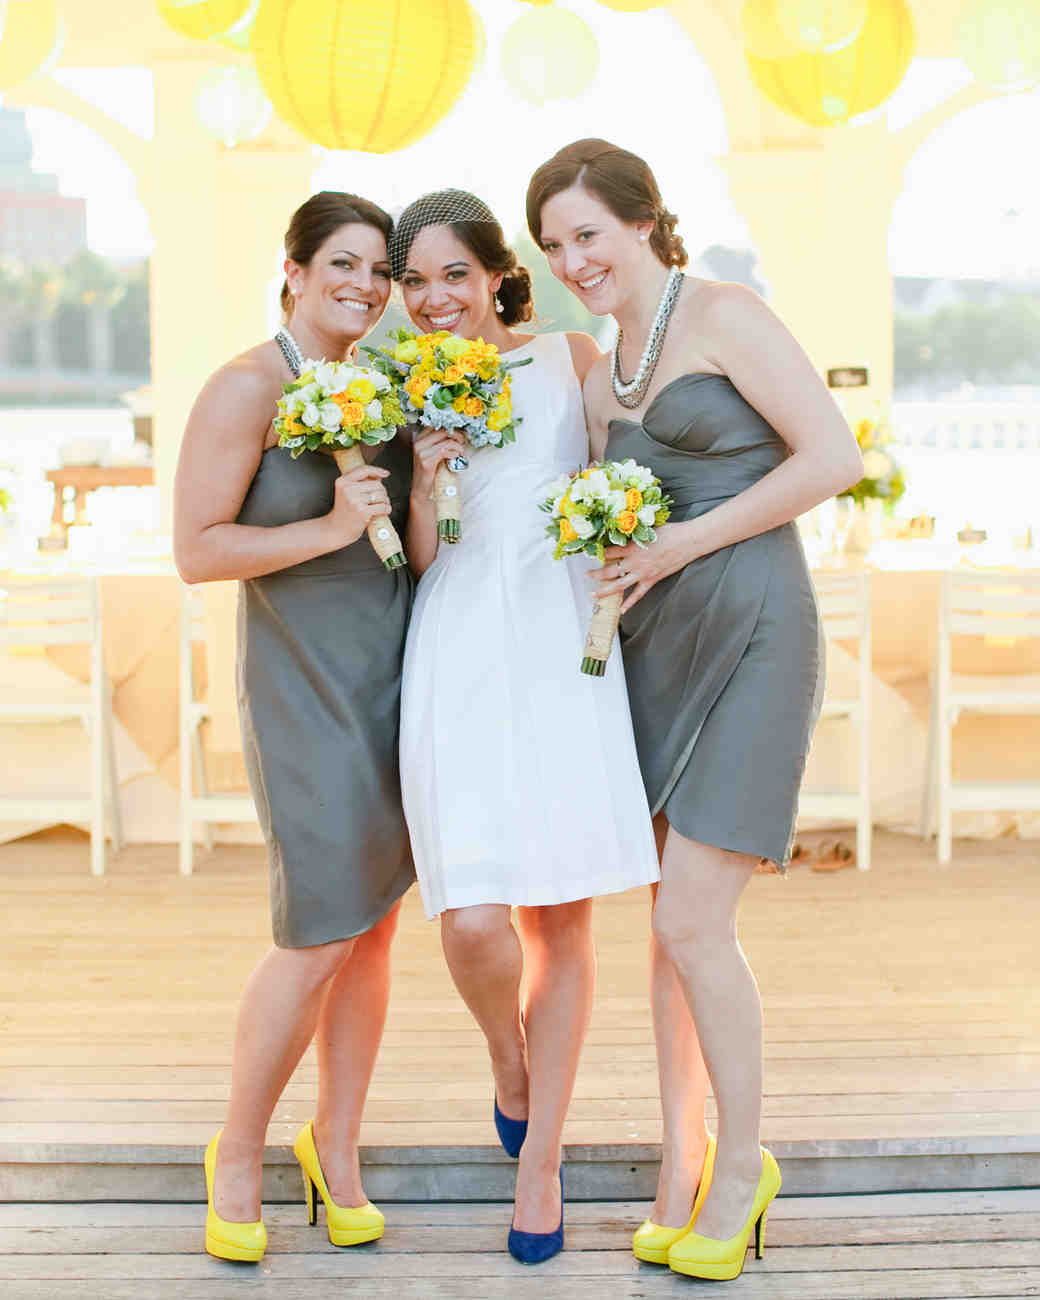 Fun Poppy Bridesmaid Dresses